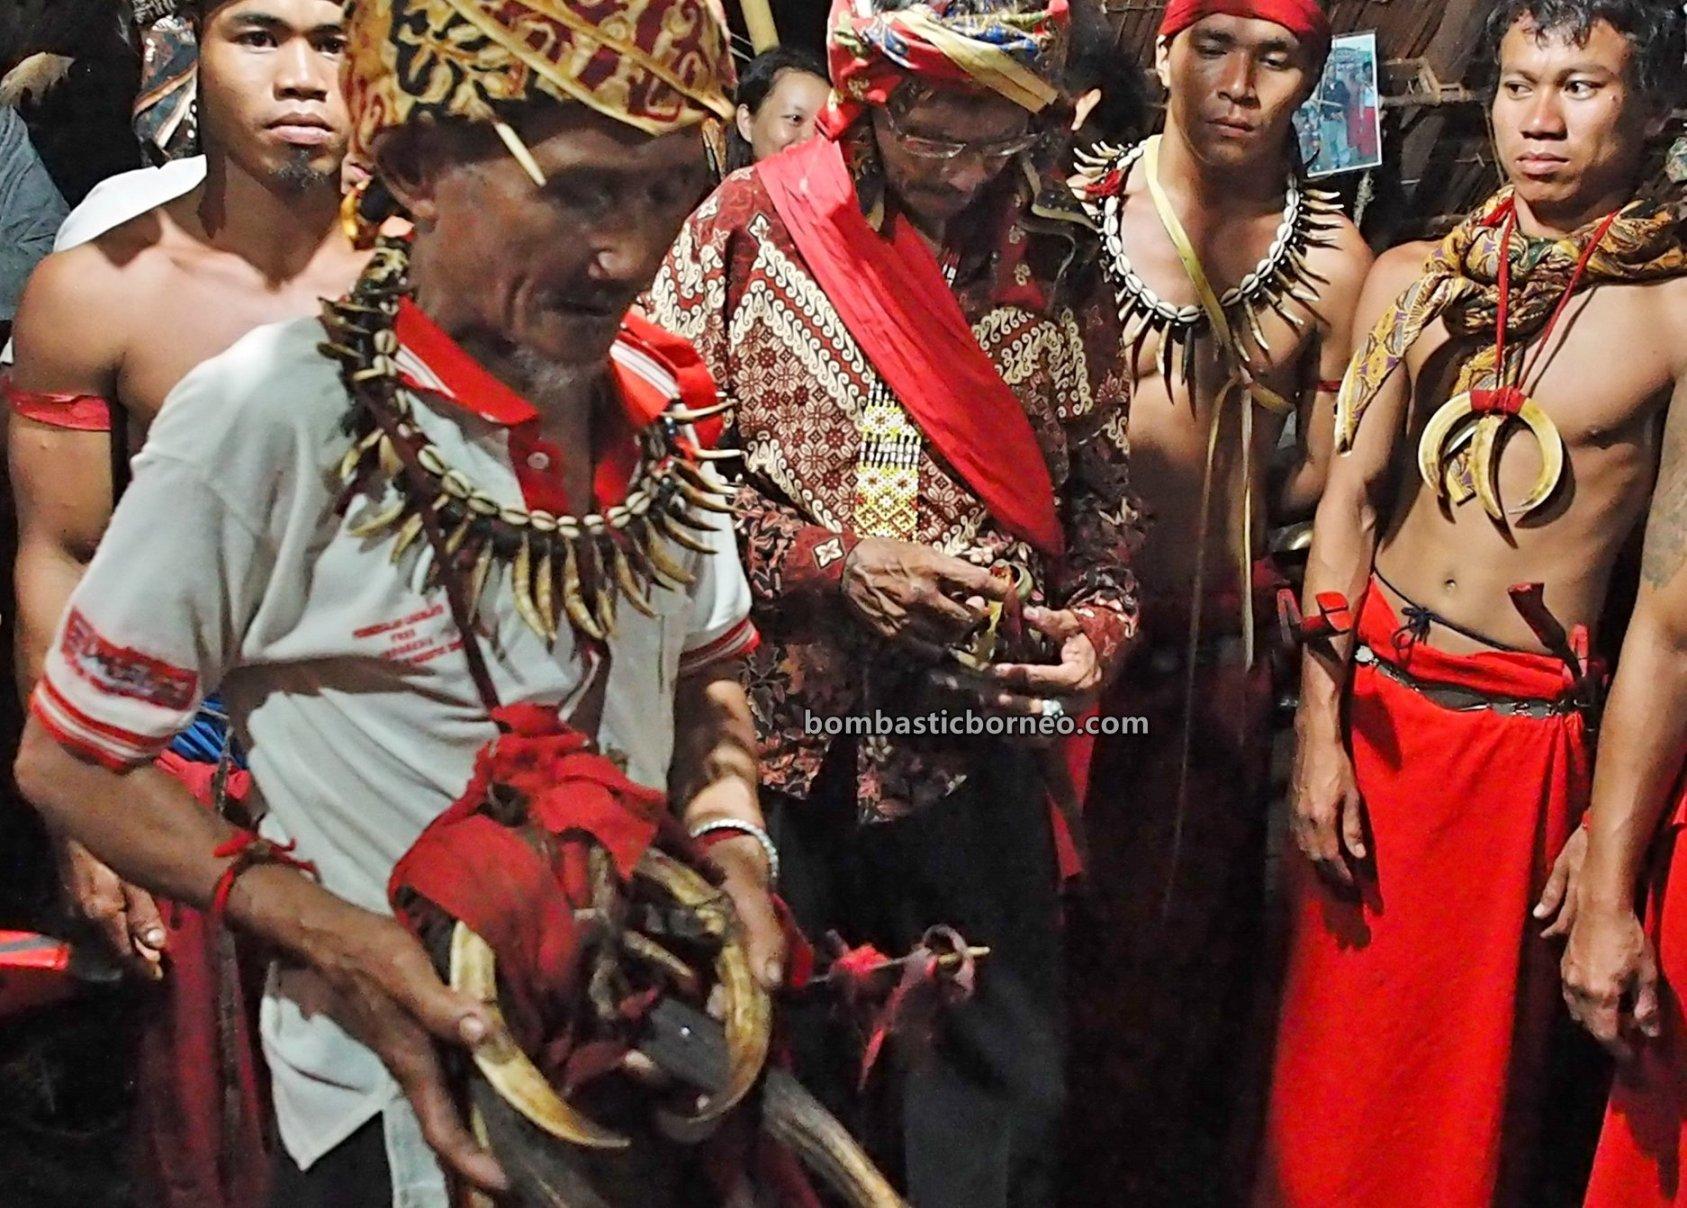 Gawai Dayak, thanksgiving, traditional, ritual, Indonesia, Ethnic, tribal, Baruk, Tourism, tourist attraction, travel guide, Cross Border, Borneo, 印尼西加里曼丹旅游, 婆罗洲达雅丰收节日, 原住民传统文化